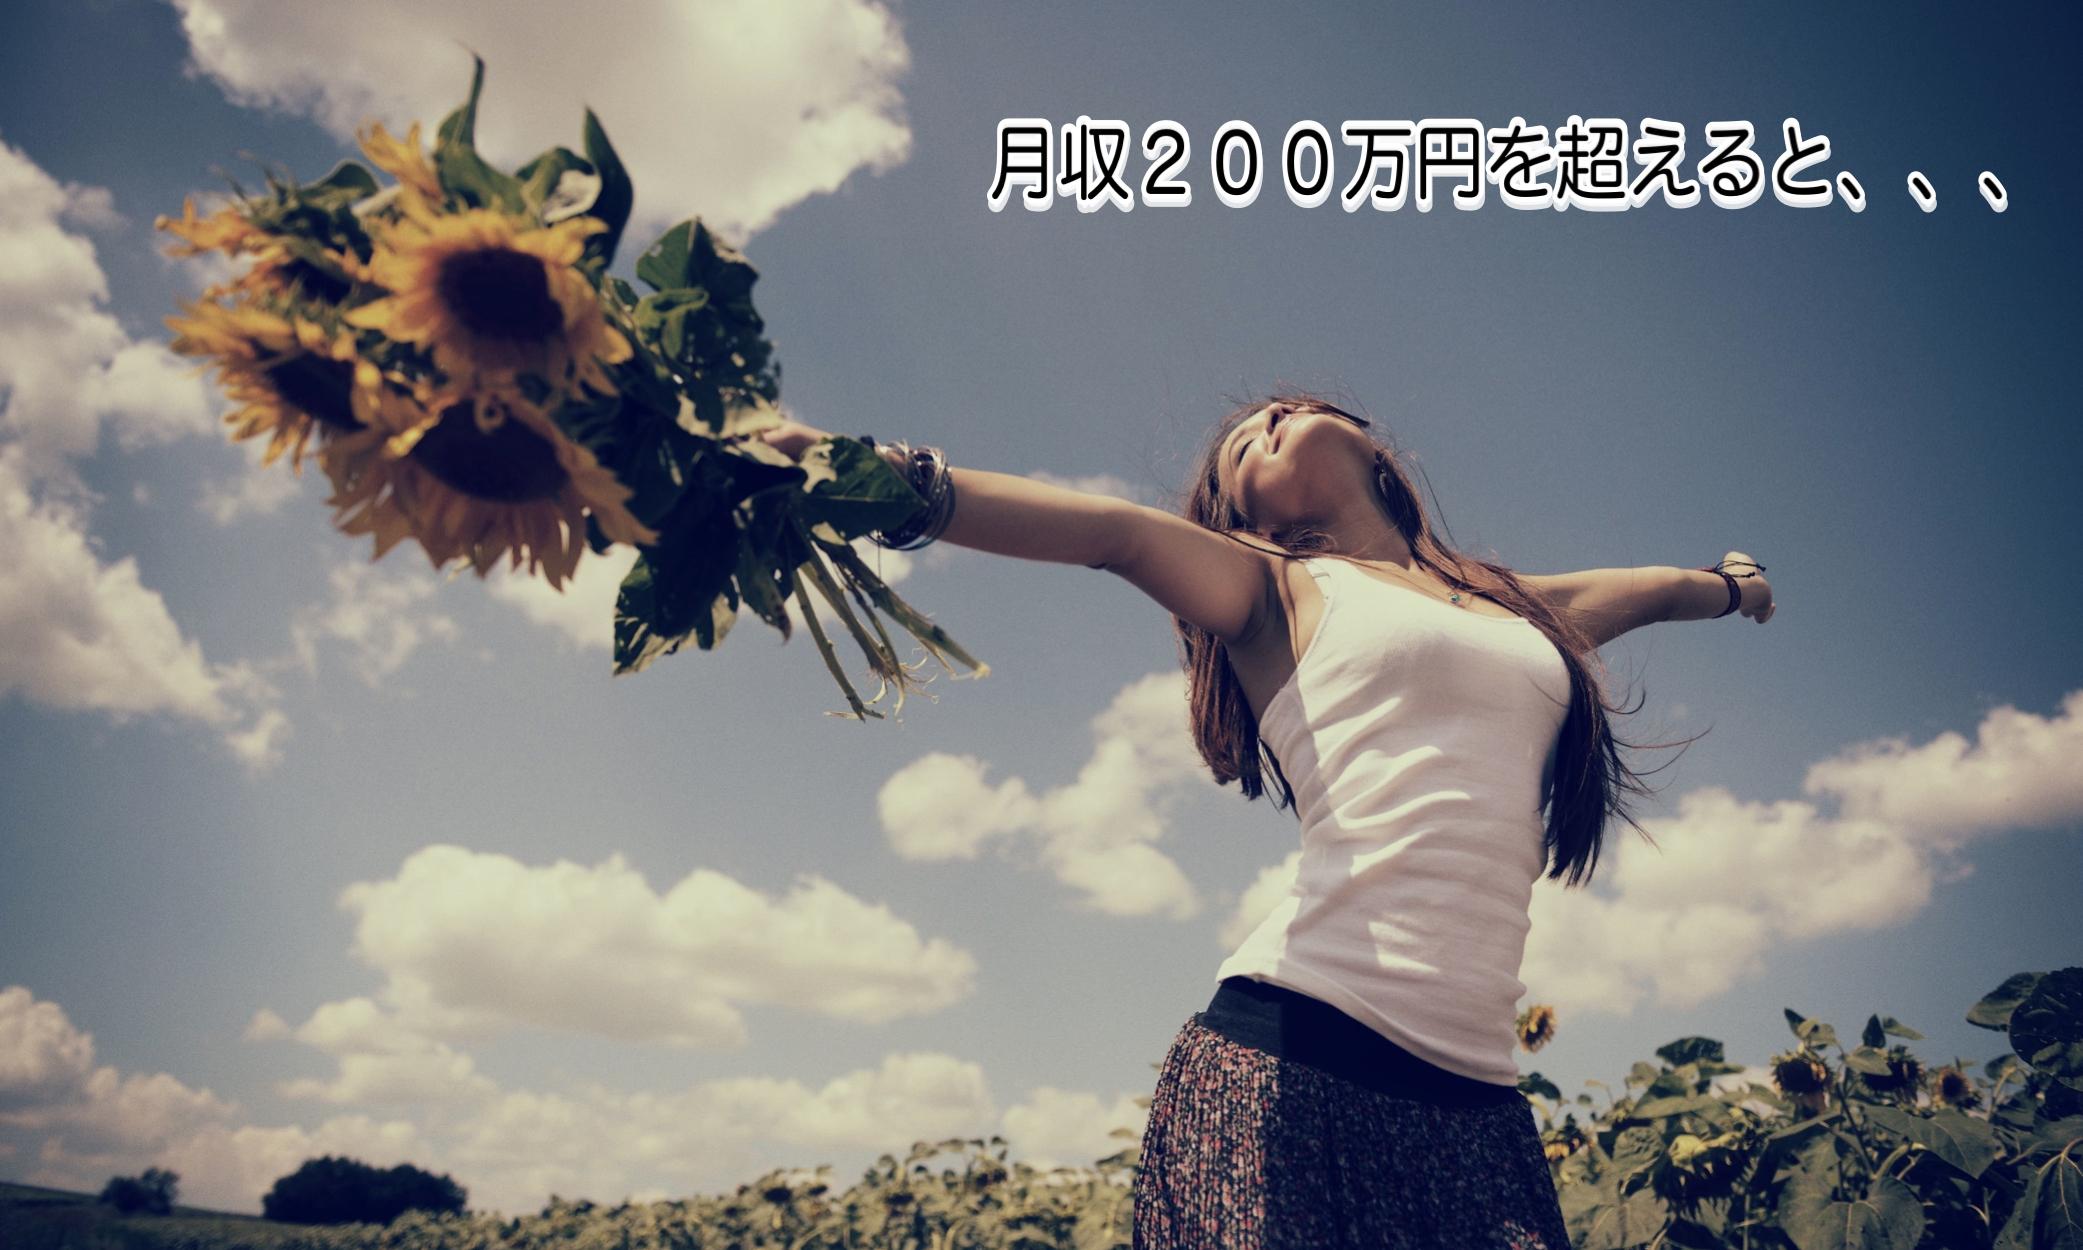 201612111700304a9.jpg